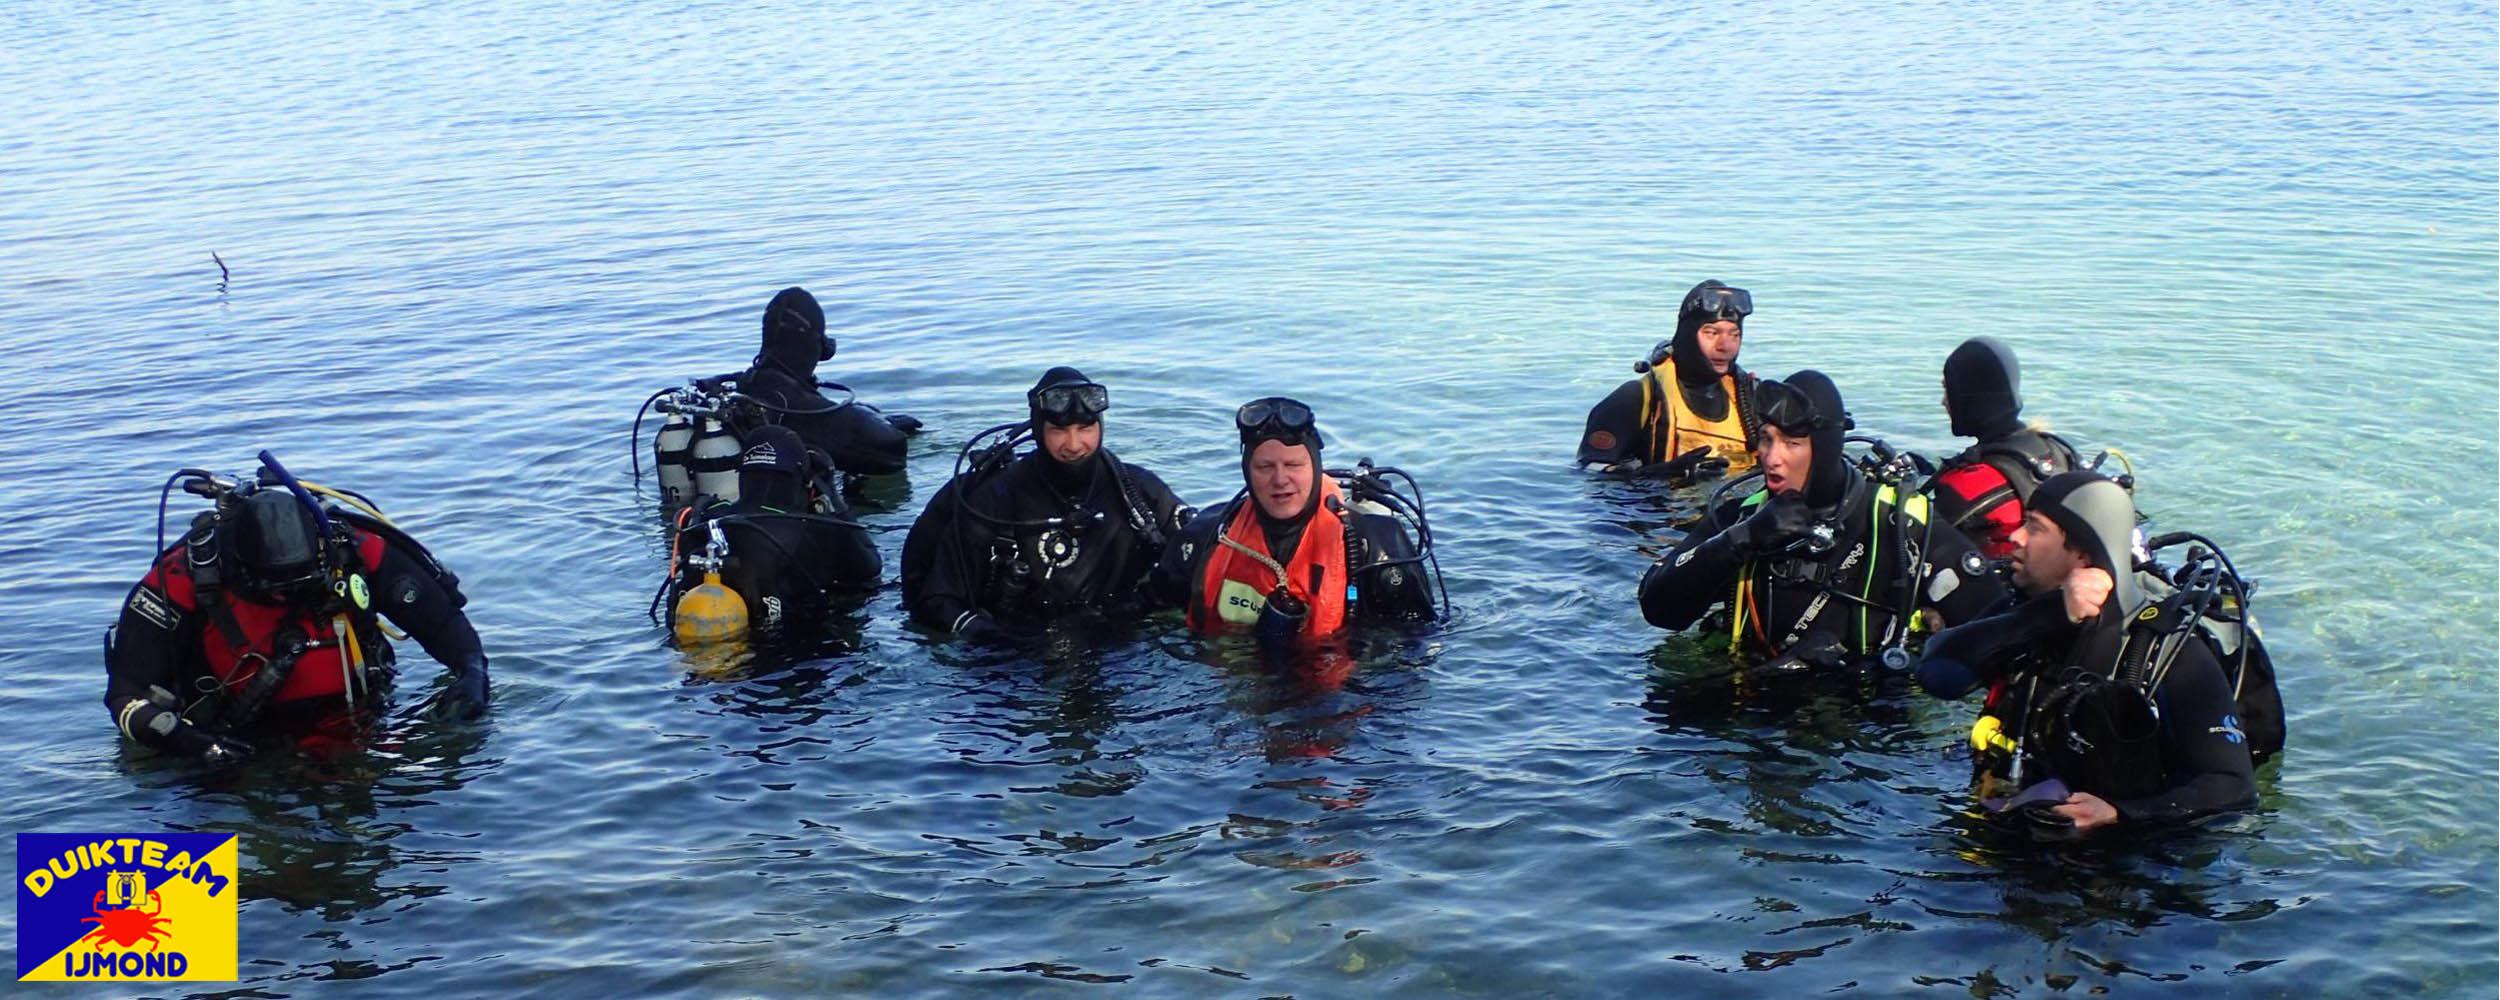 duikteam ijmond duiken in nederland